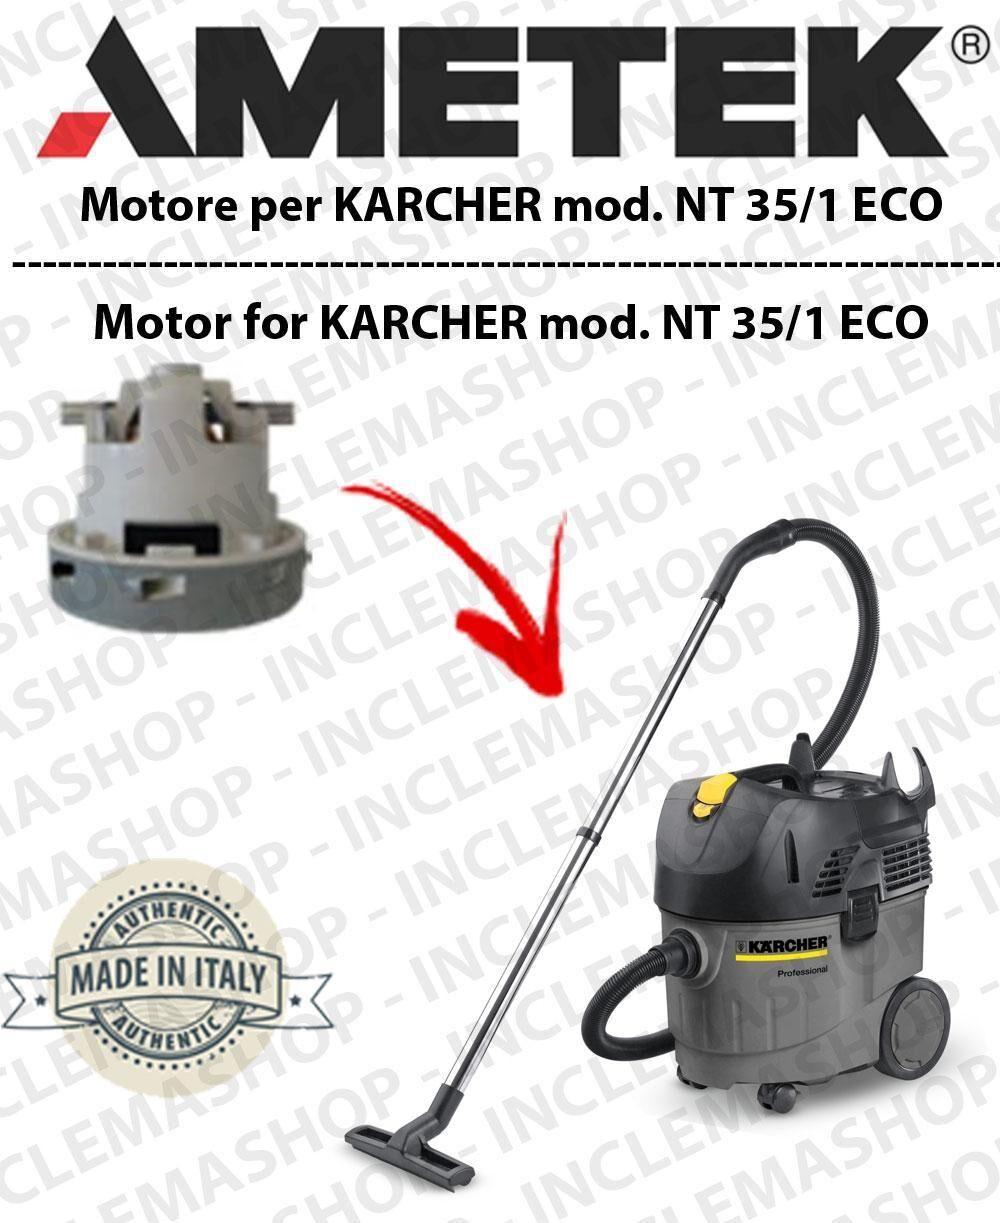 Karcher NT 35/1 ECO automatic MOTORE AMETEK aspirazione per aspirapolvere